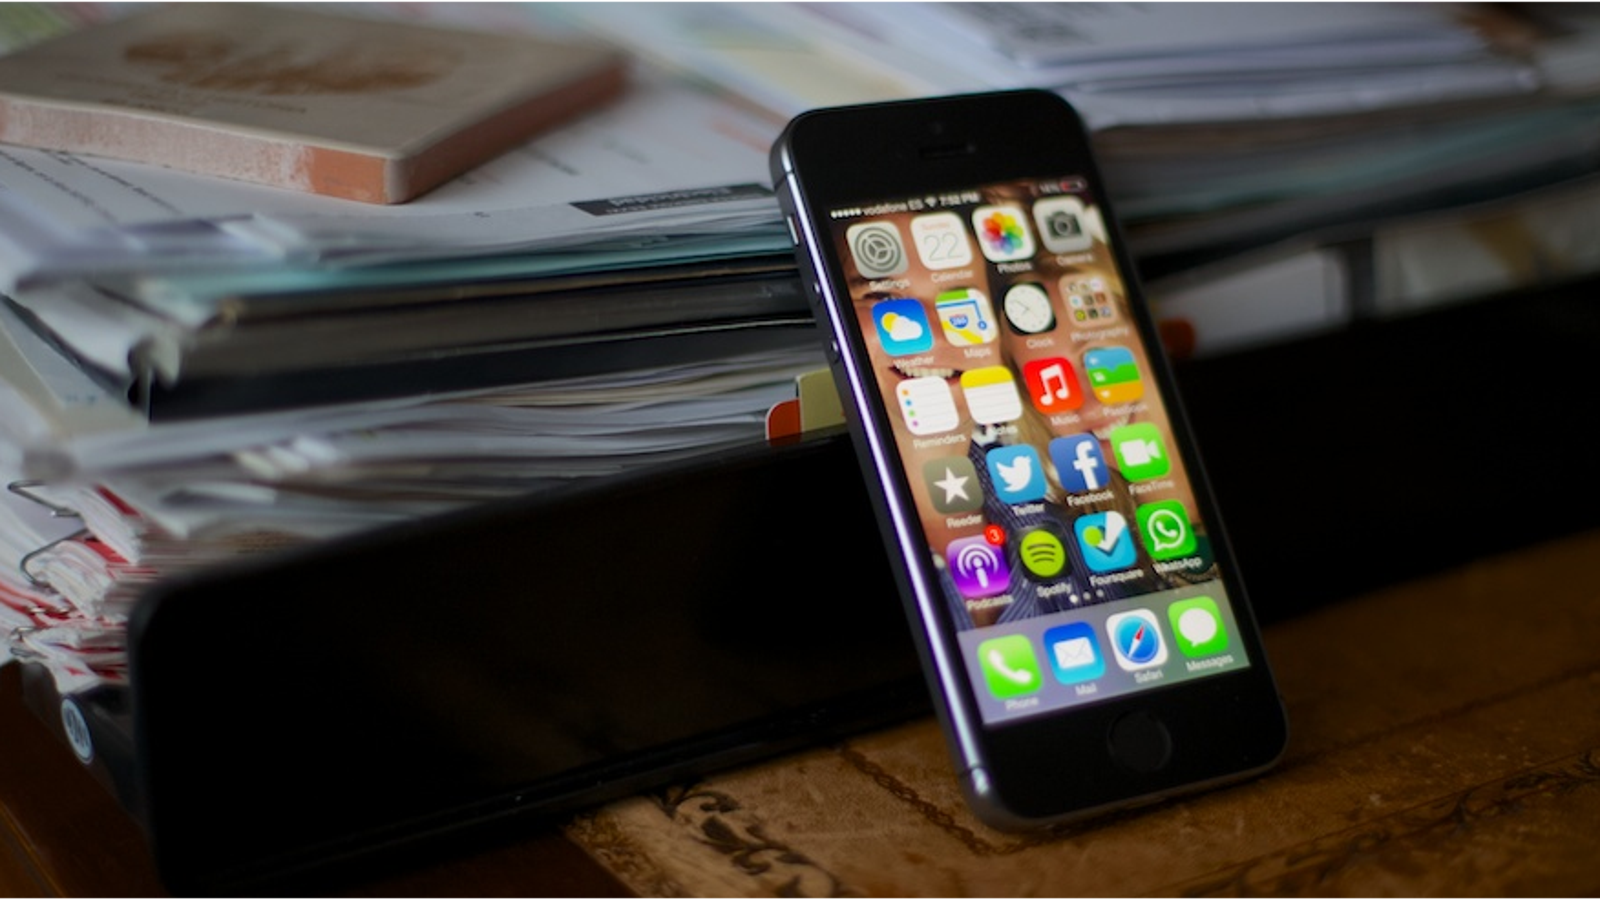 Un fallo en Siri permite llamar o enviar emails con pantalla bloqueada